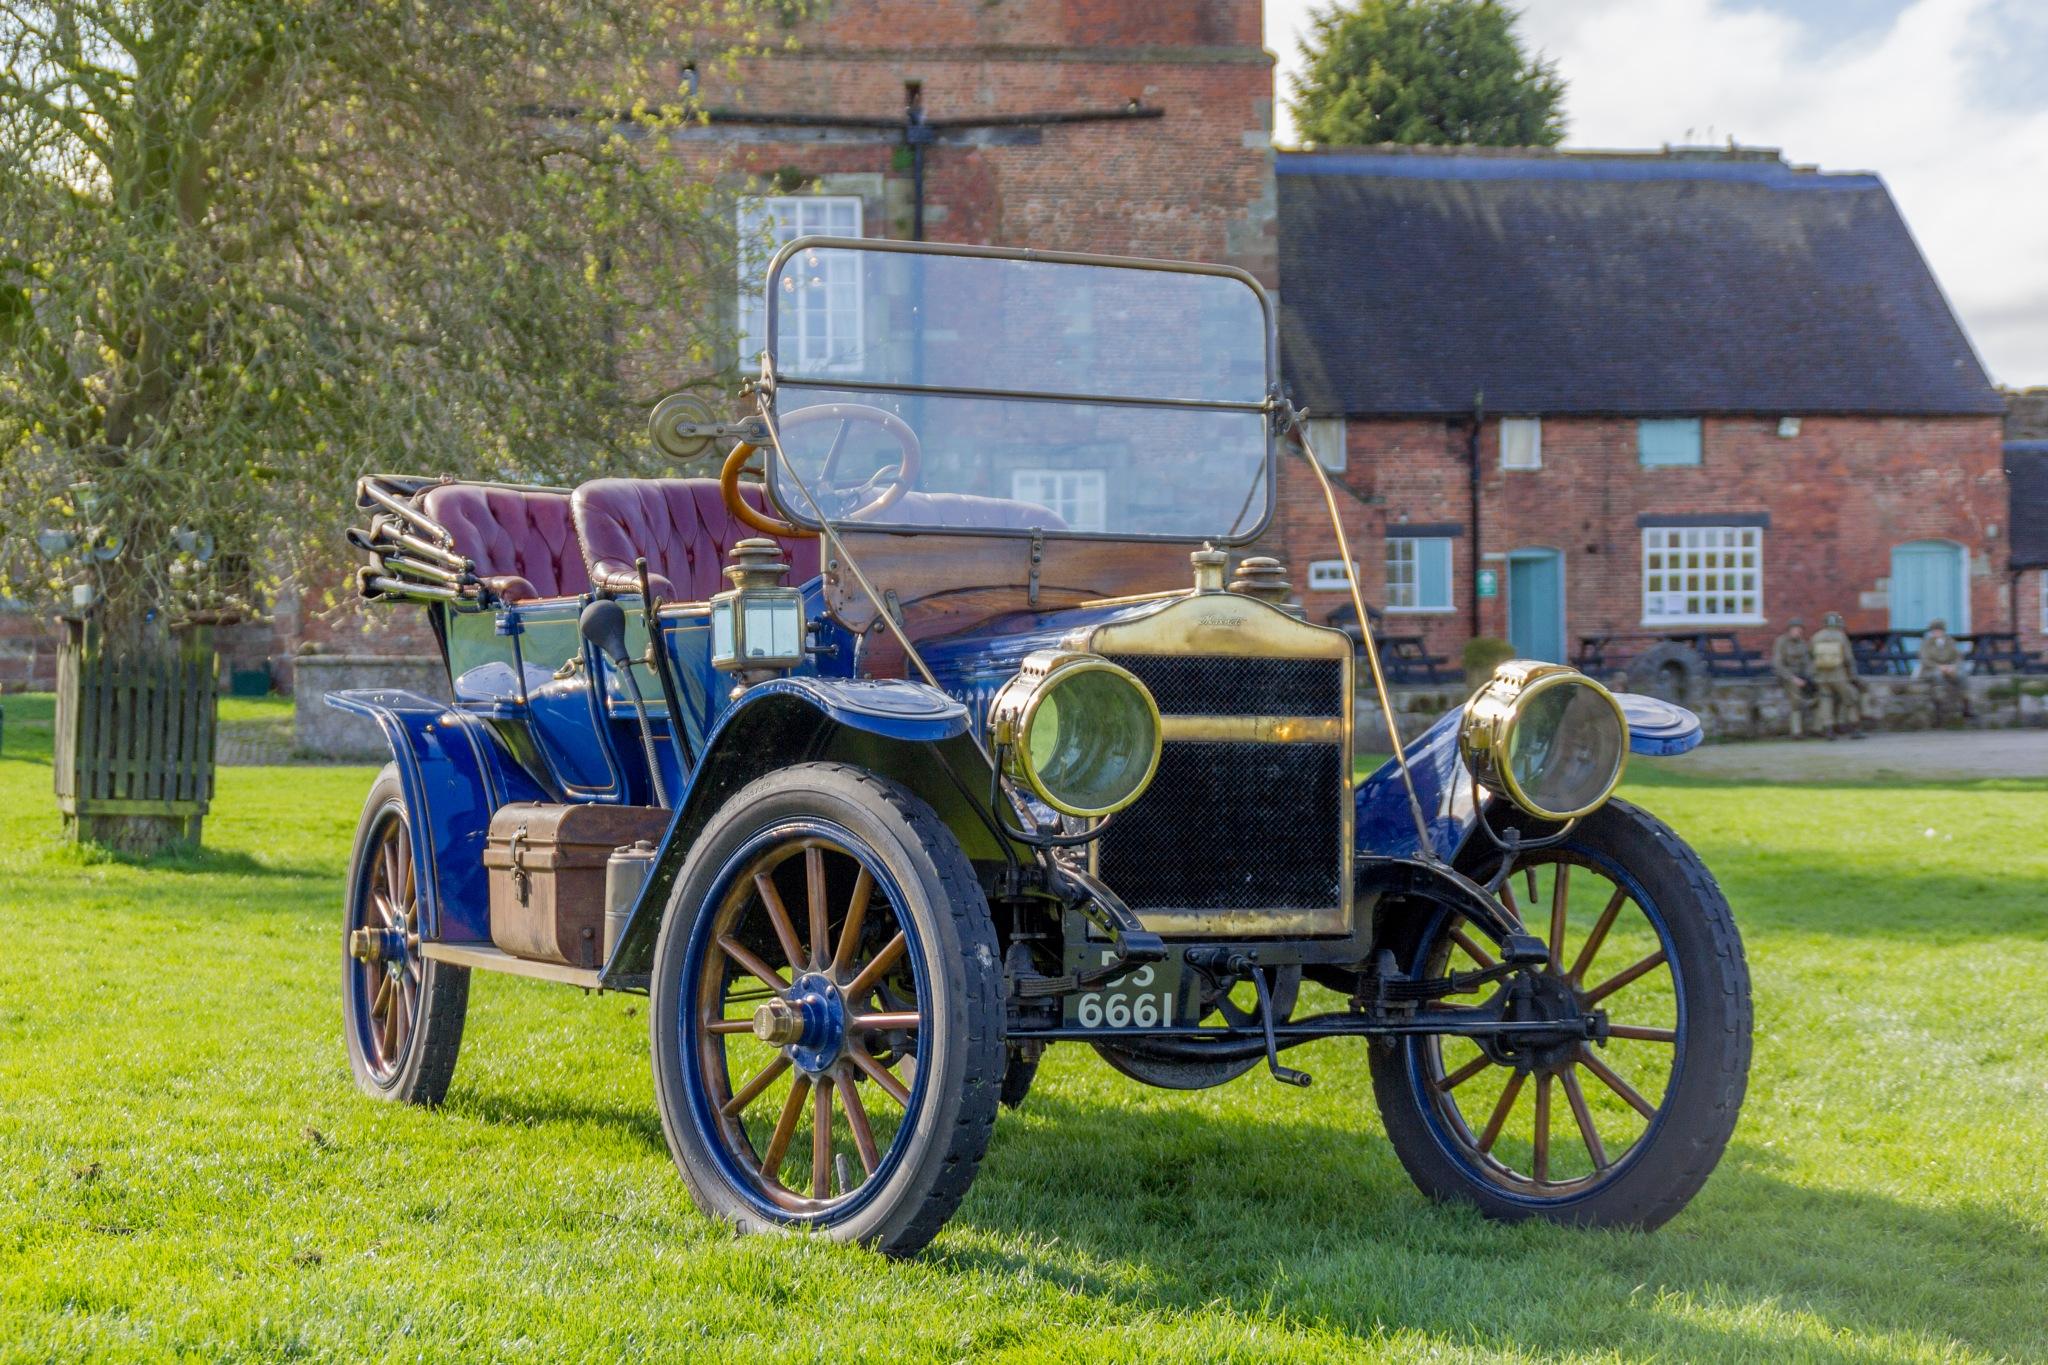 Old Car by Alan Gallagher